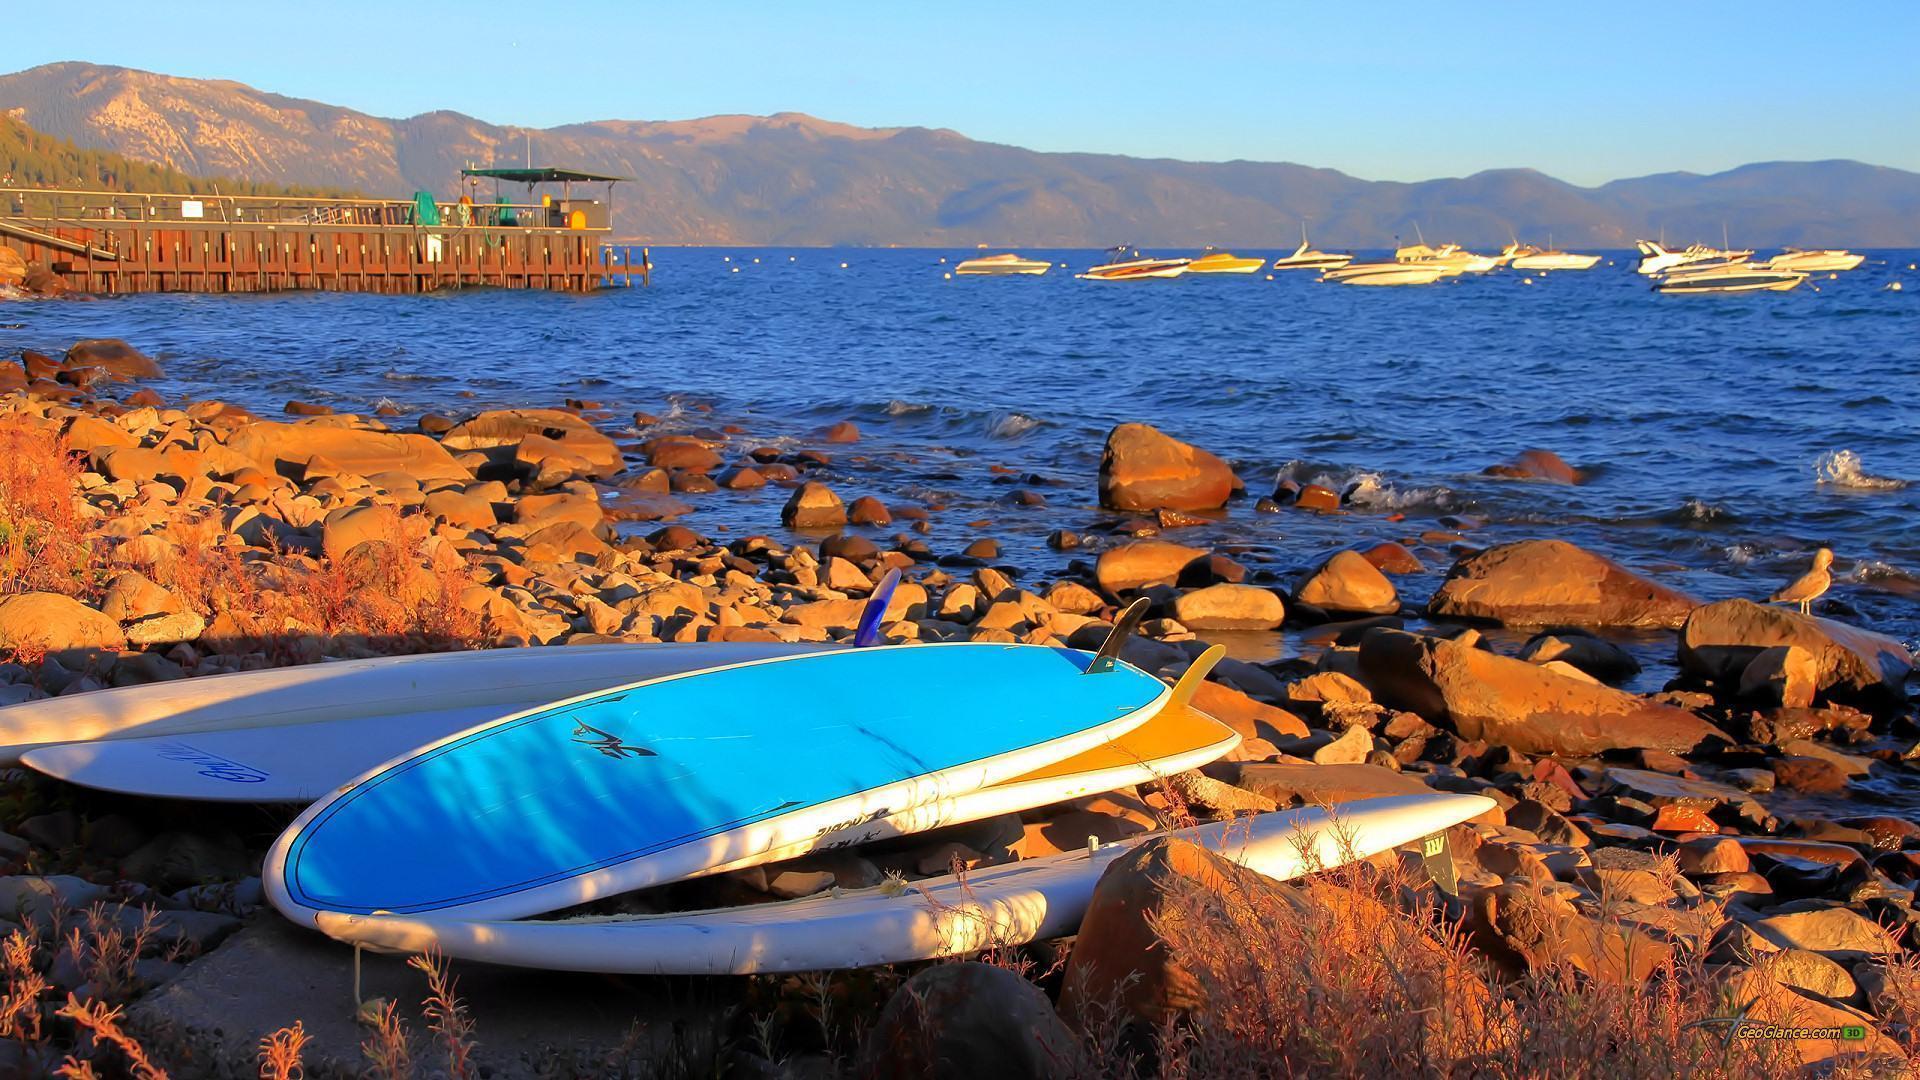 Surfboard Desktop Wallpaper